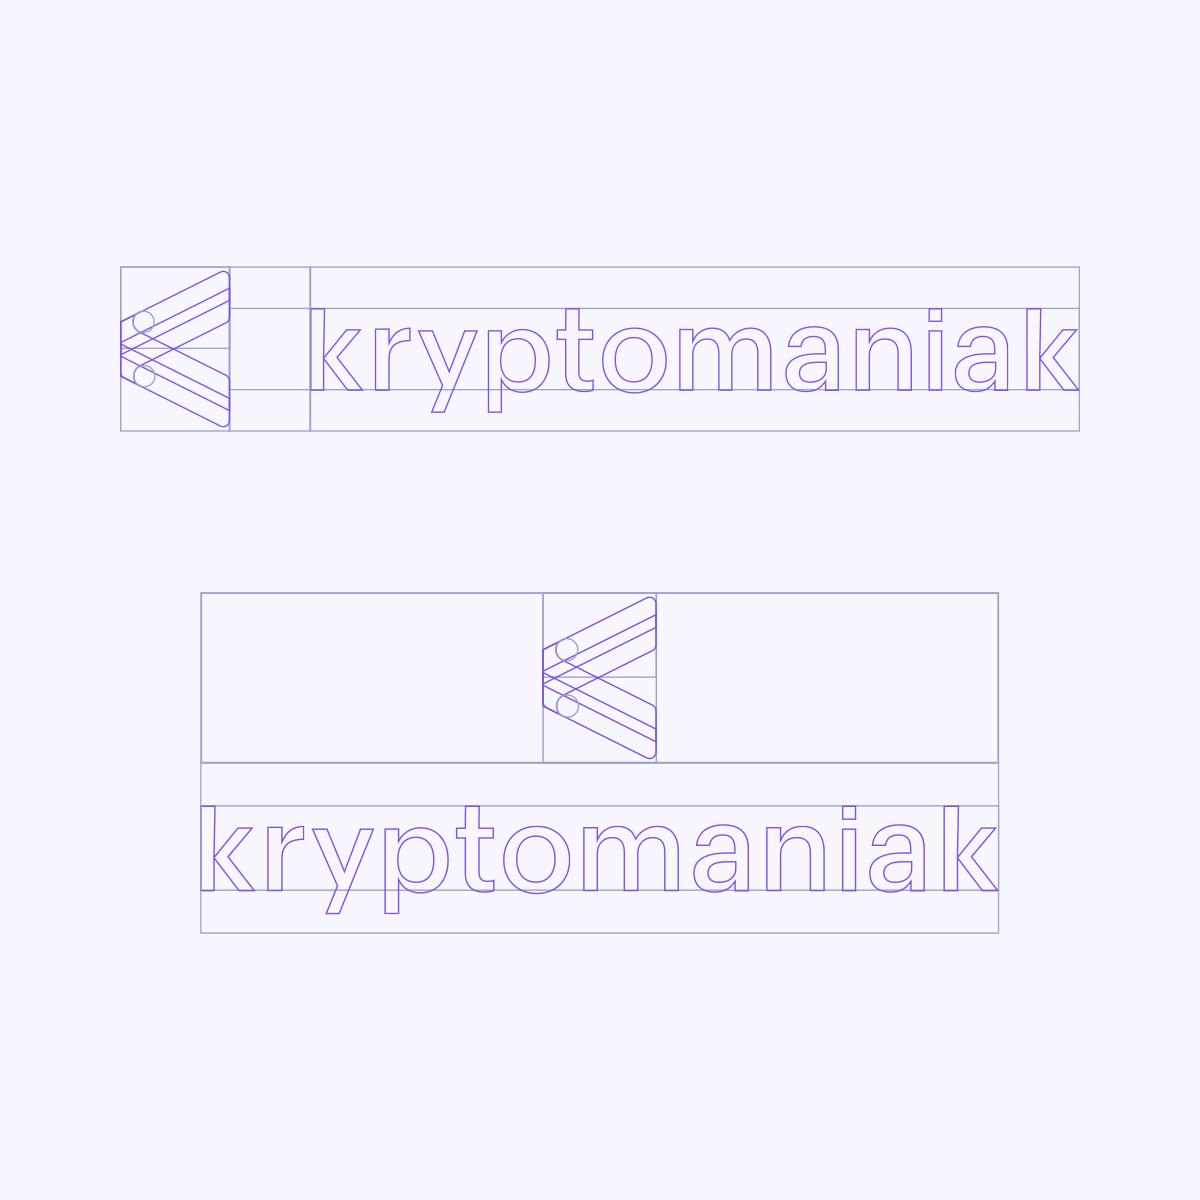 Logo-construction@2x-3